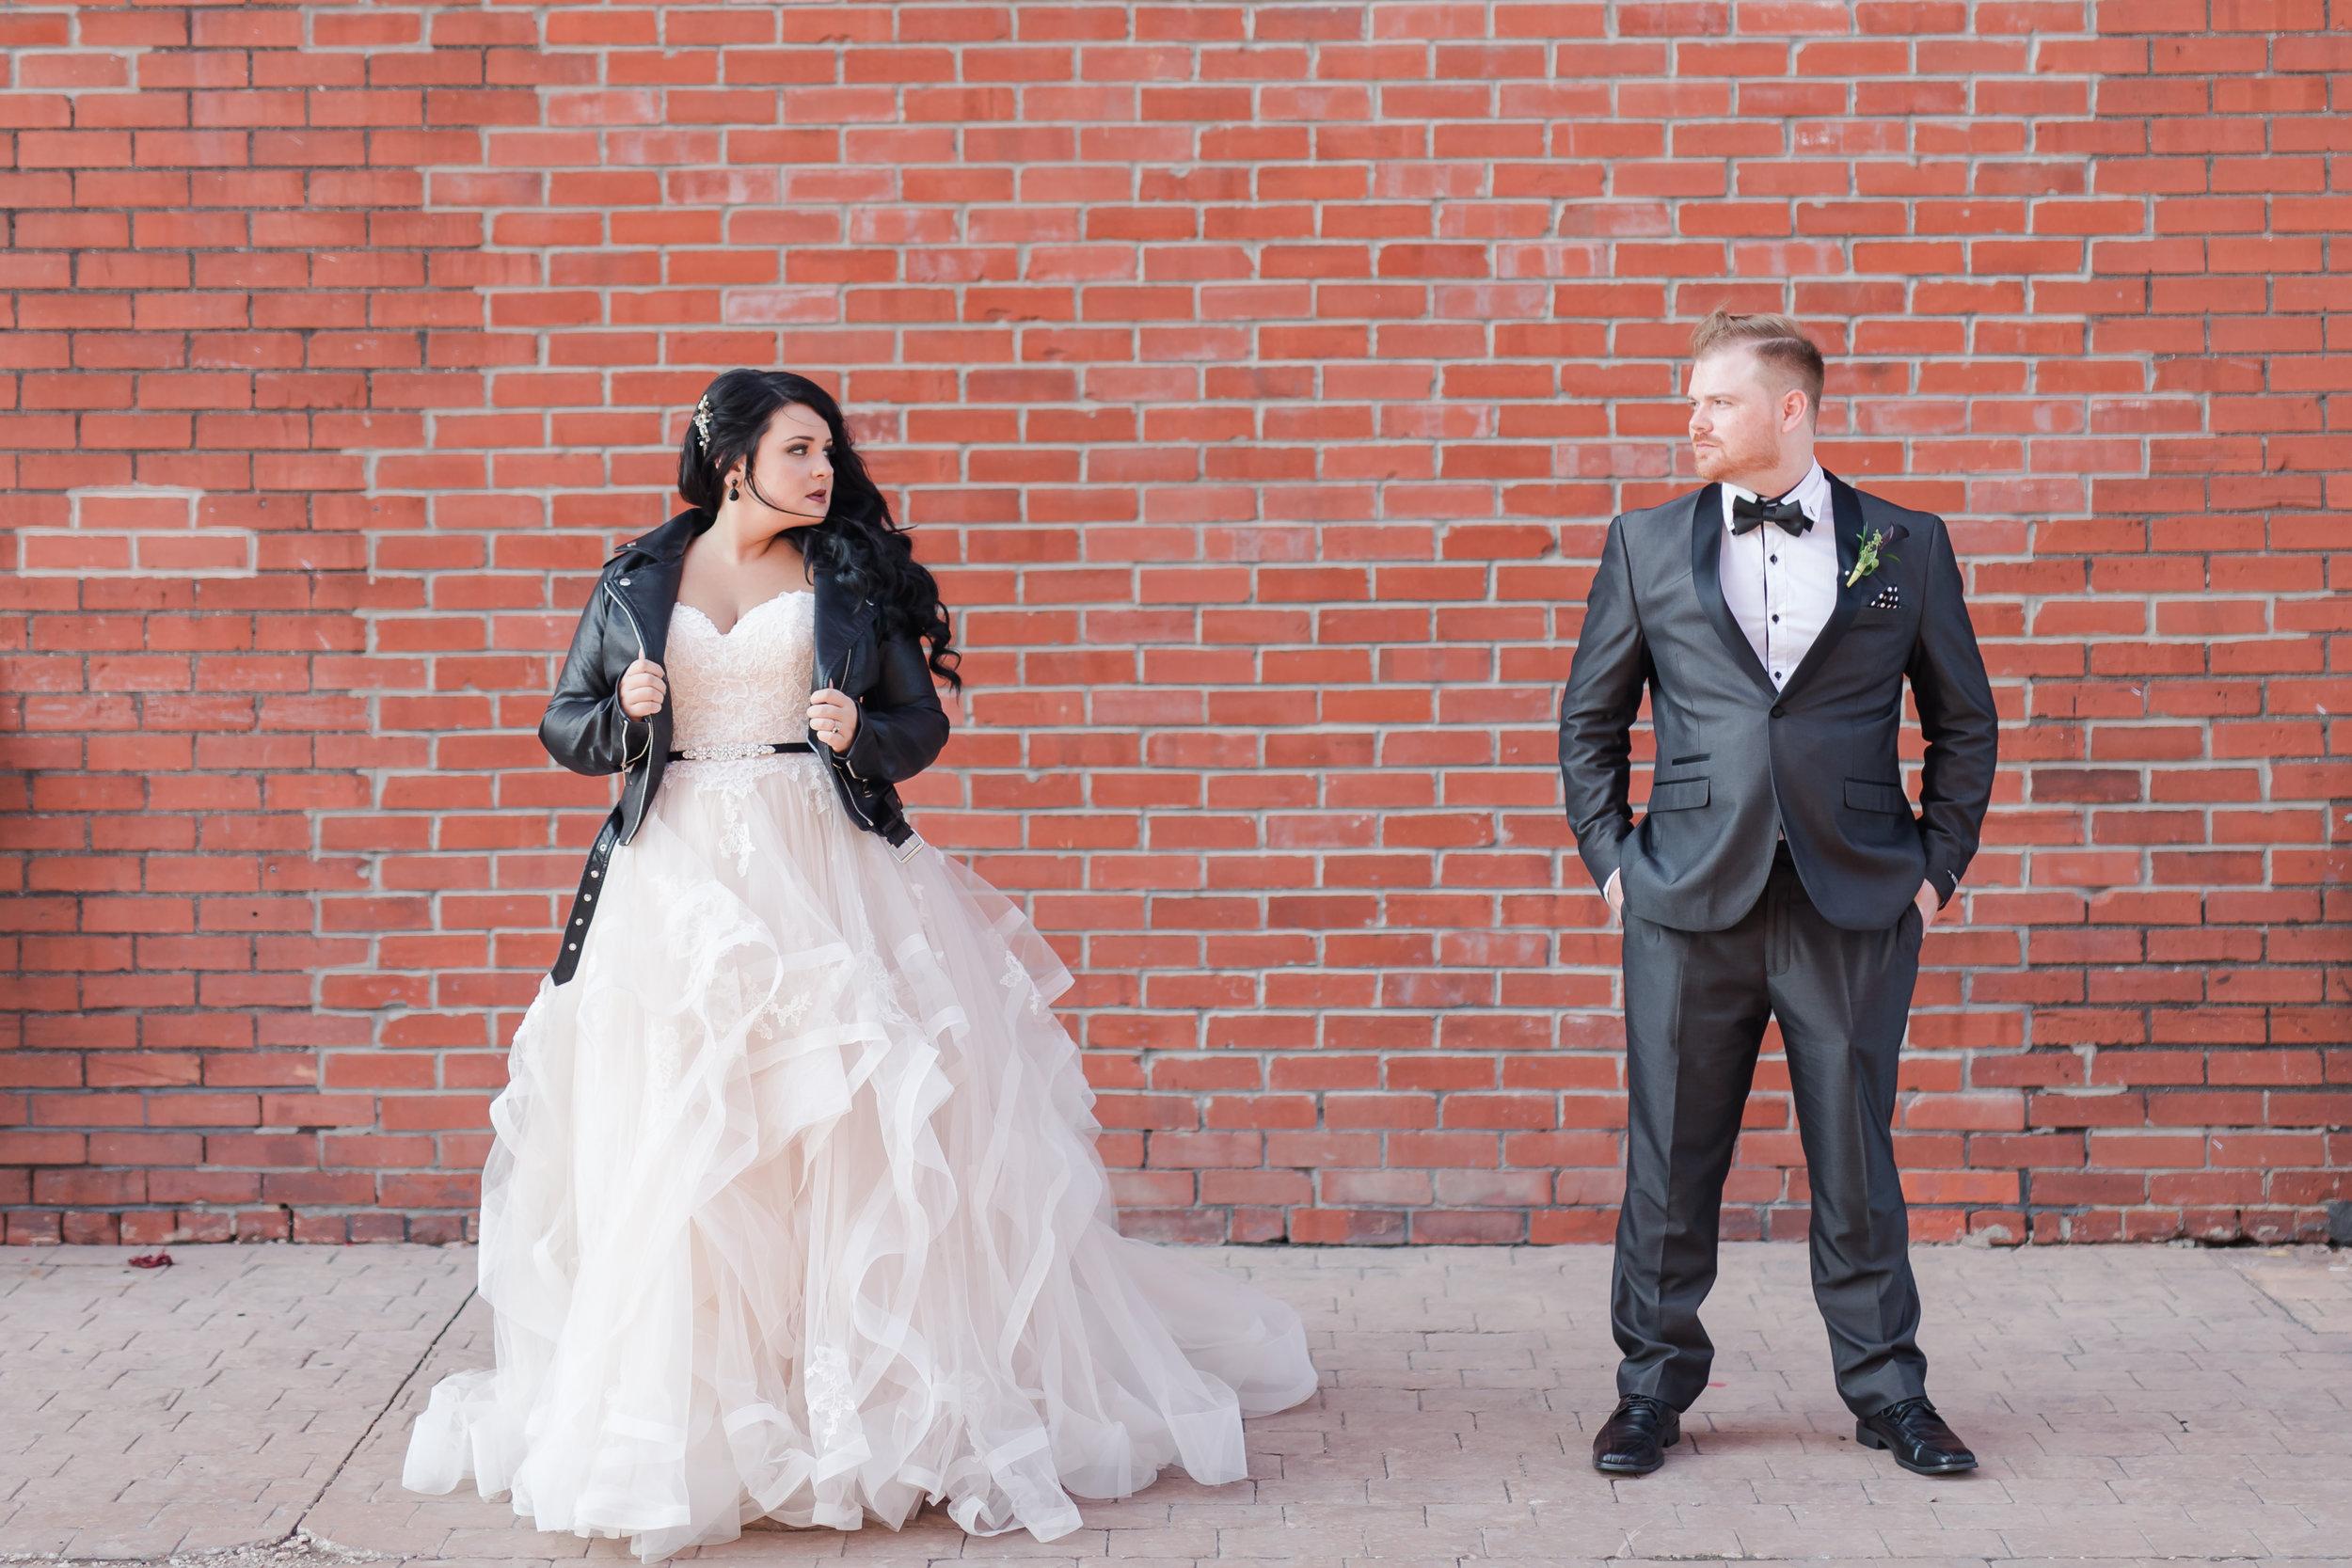 wedding-podcast-wedding-planning (11).jpg